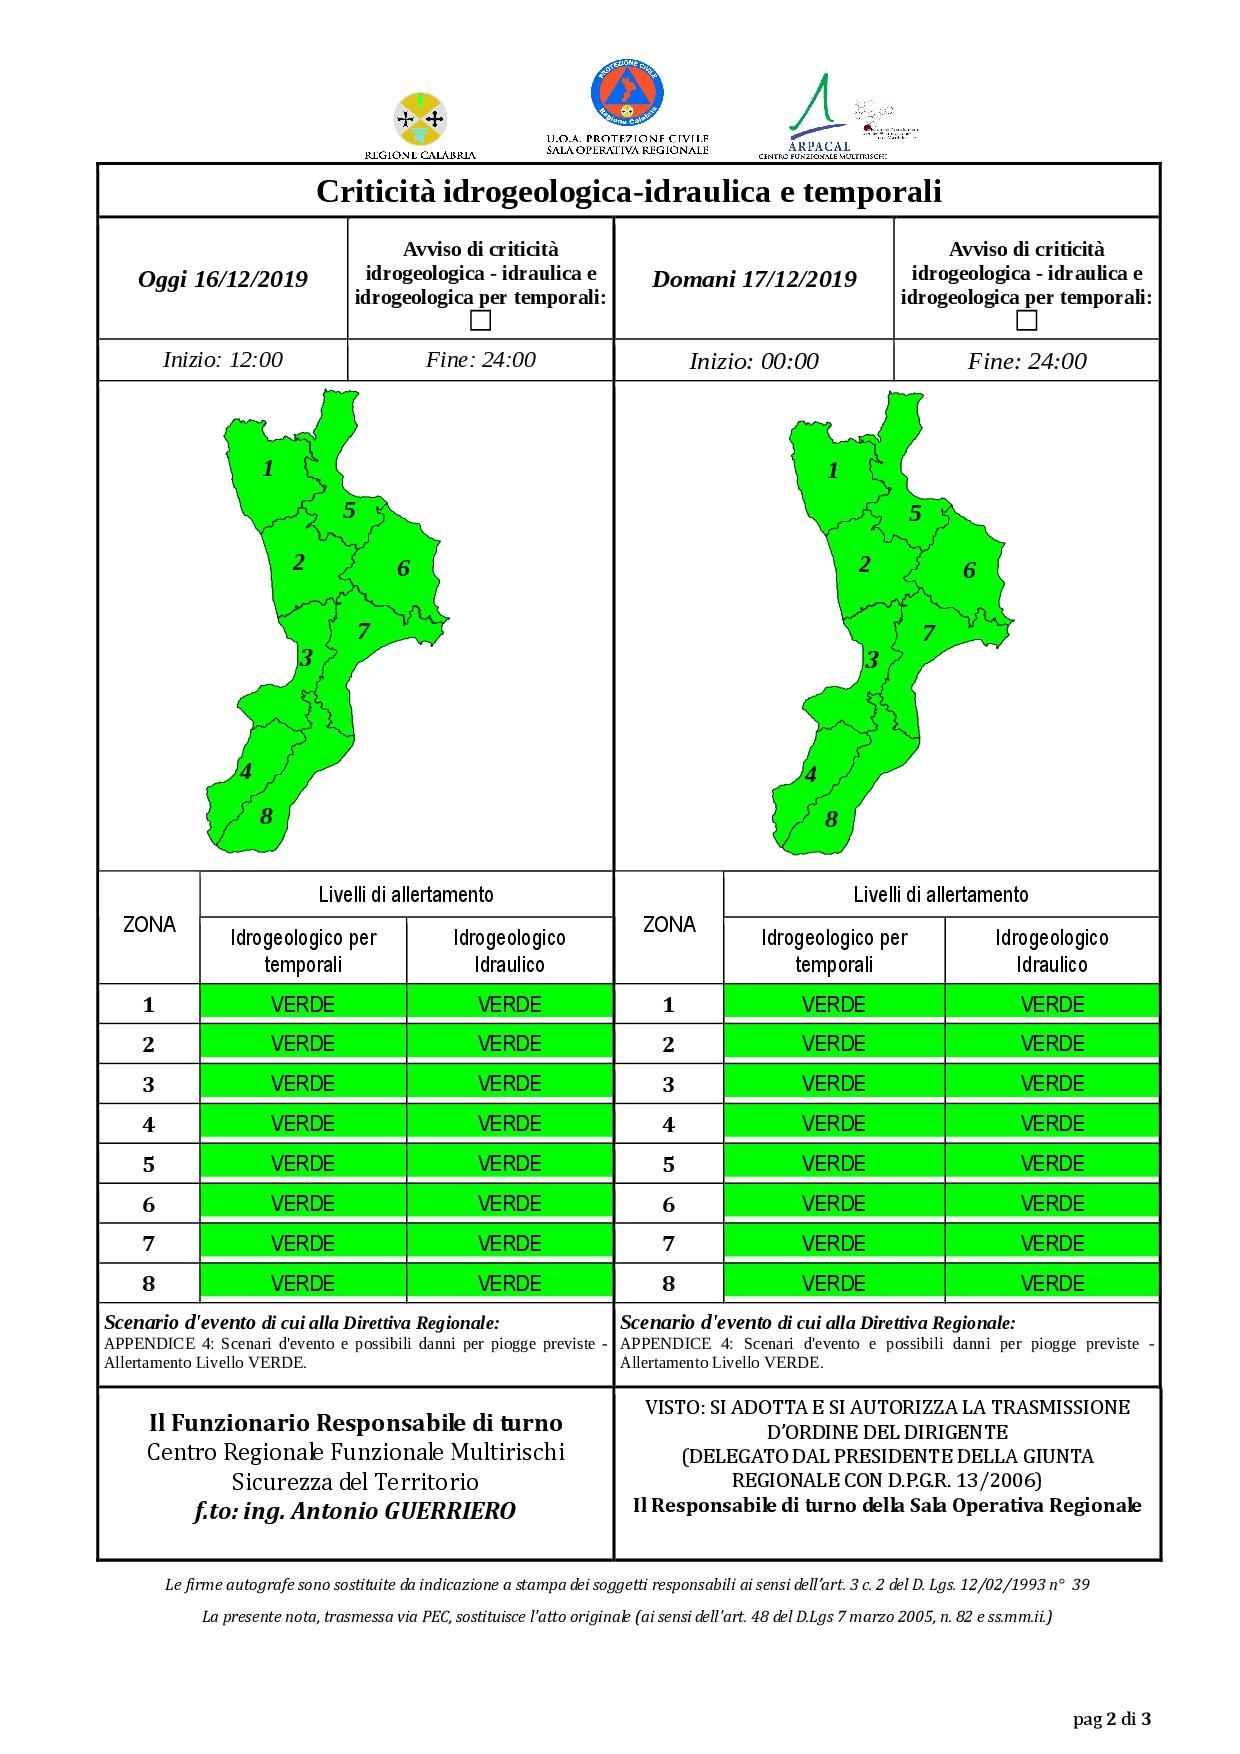 Criticità idrogeologica-idraulica e temporali in Calabria 16-12-2019